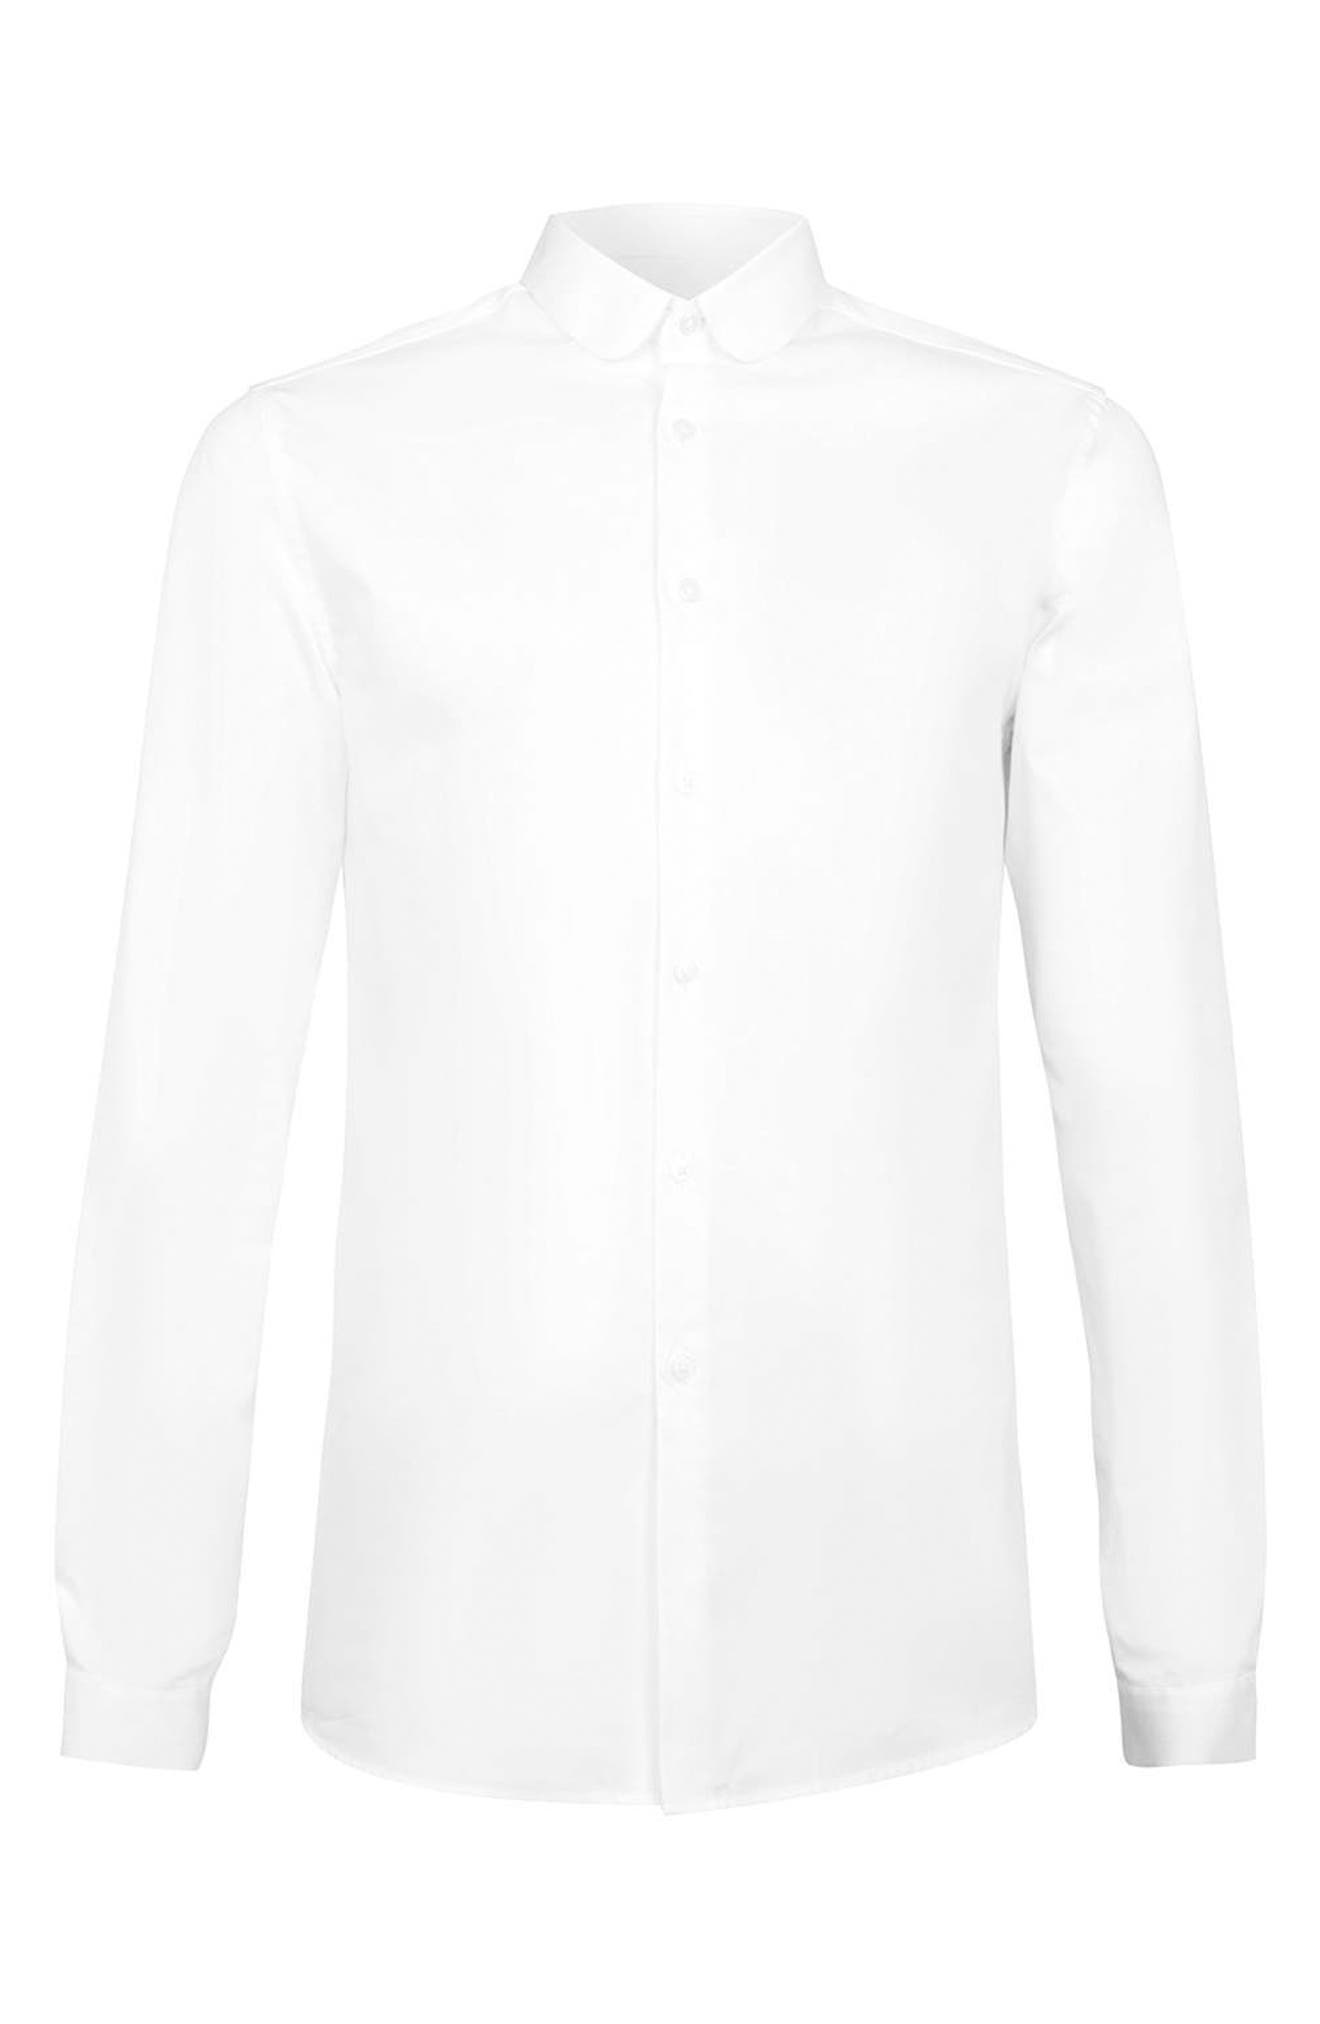 Penny Collar Shirt,                             Alternate thumbnail 4, color,                             100